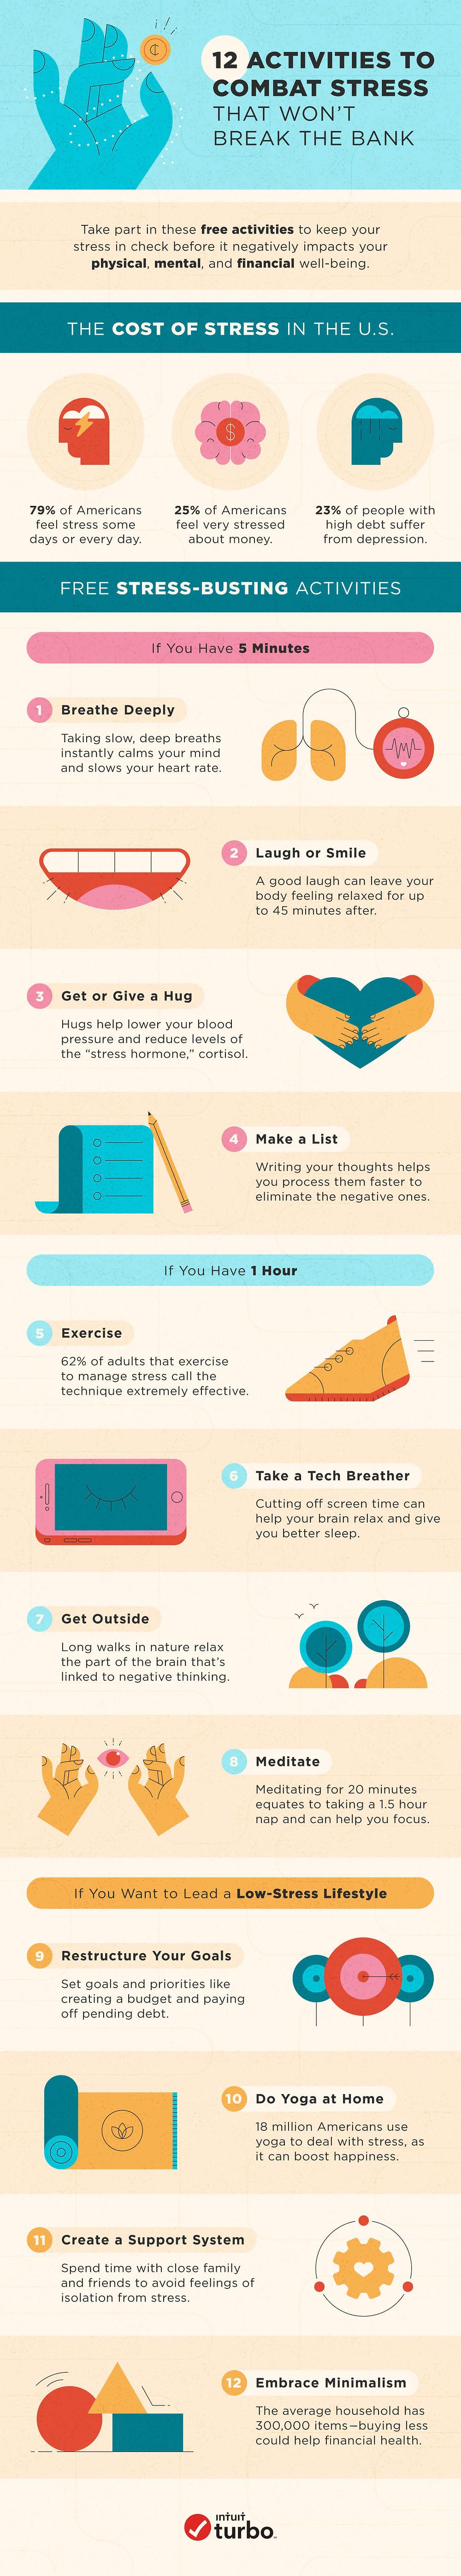 12 activities to combat stress that won't break the bank